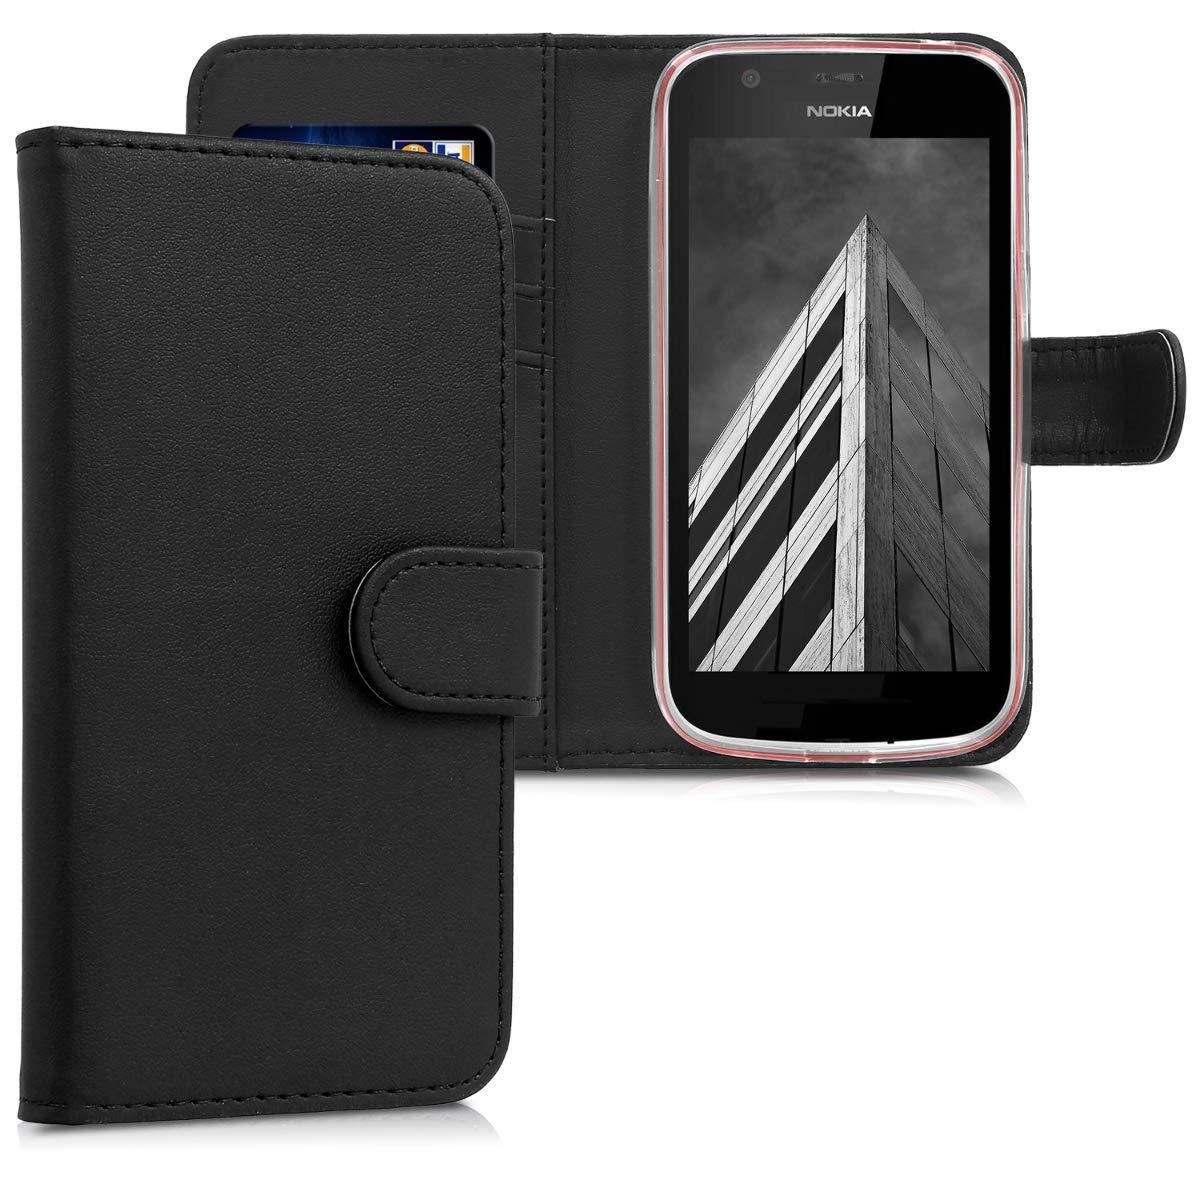 KW Θήκη - Πορτοφόλι Nokia 1 - Black (44504.01)